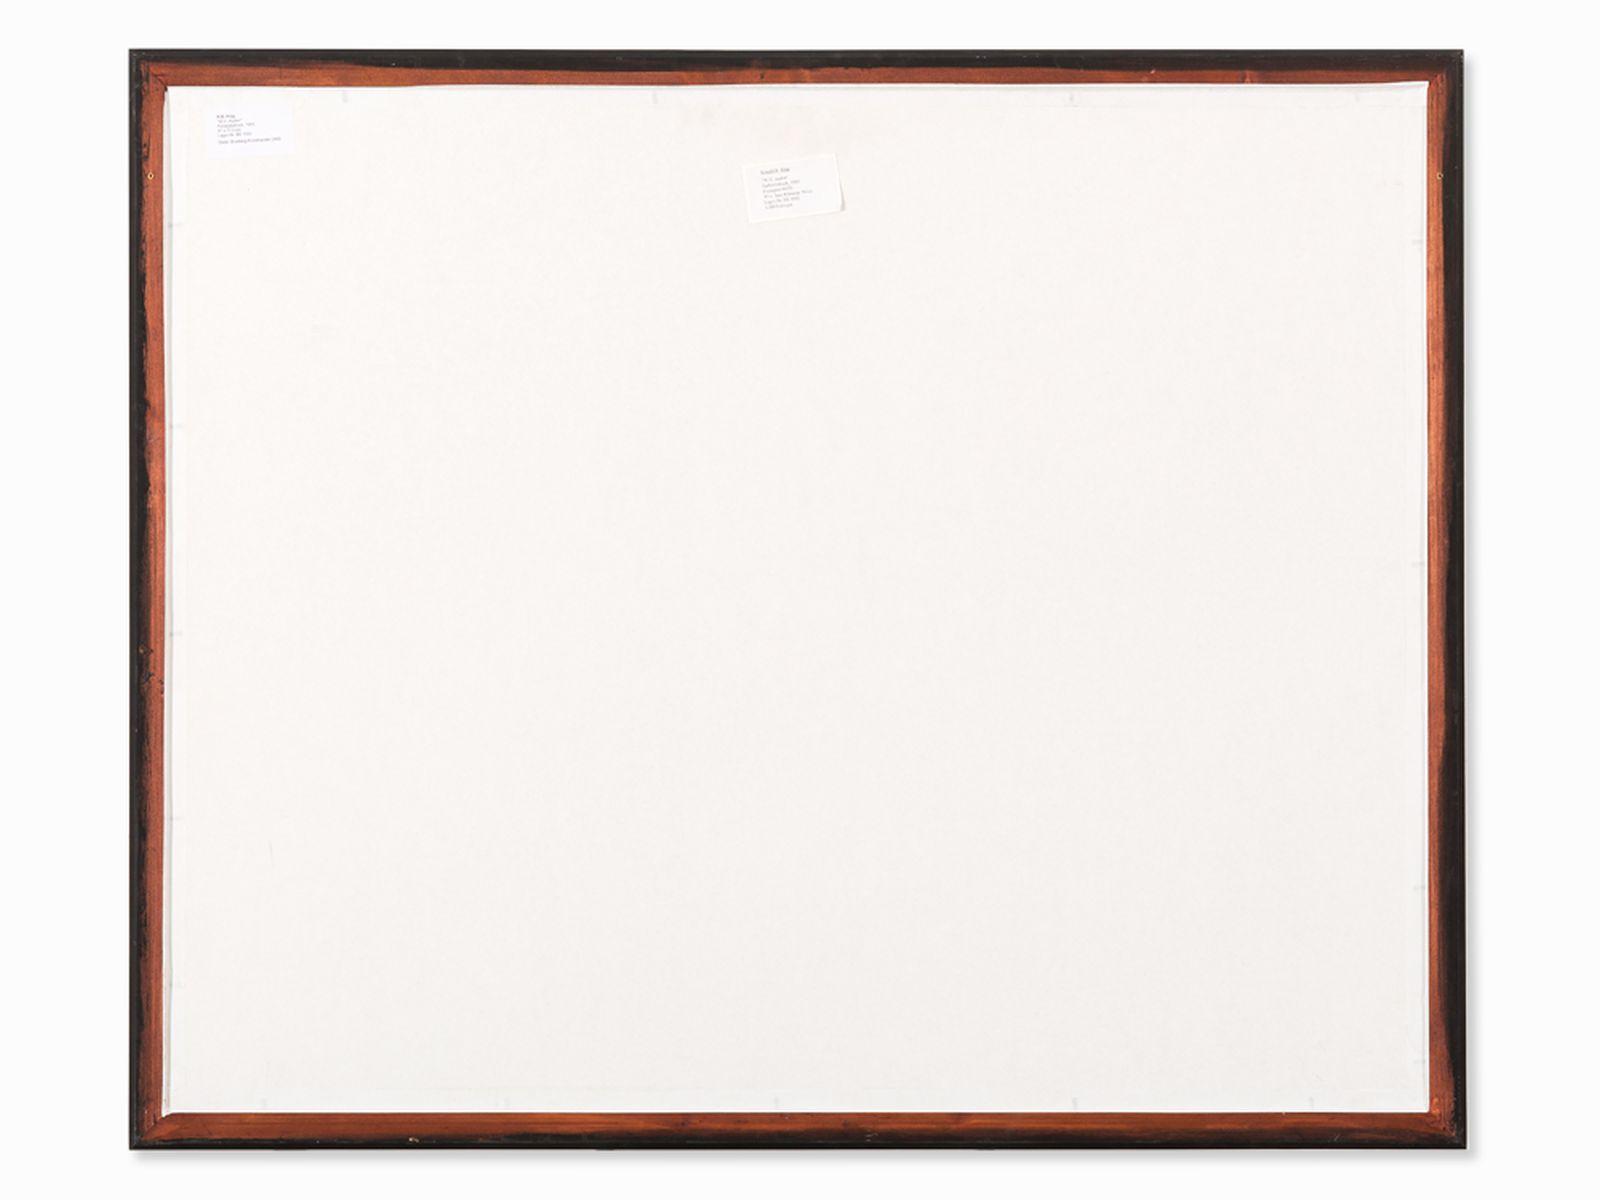 R.B. Kitaj (1887-1948), W.H. Auden, Color Serigraph, 1969 - Image 10 of 10